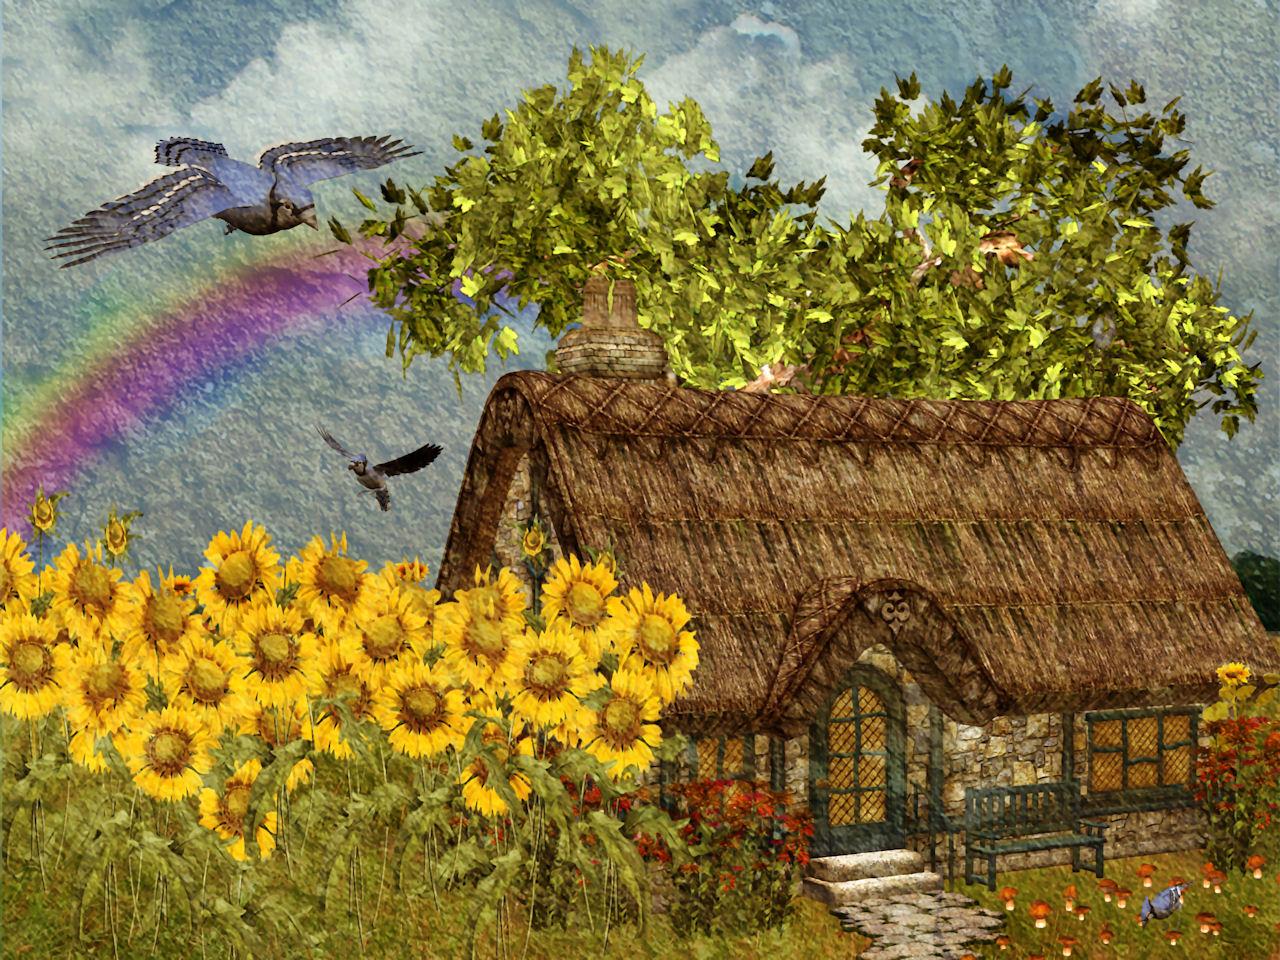 Little Cottage by TheFantaSim